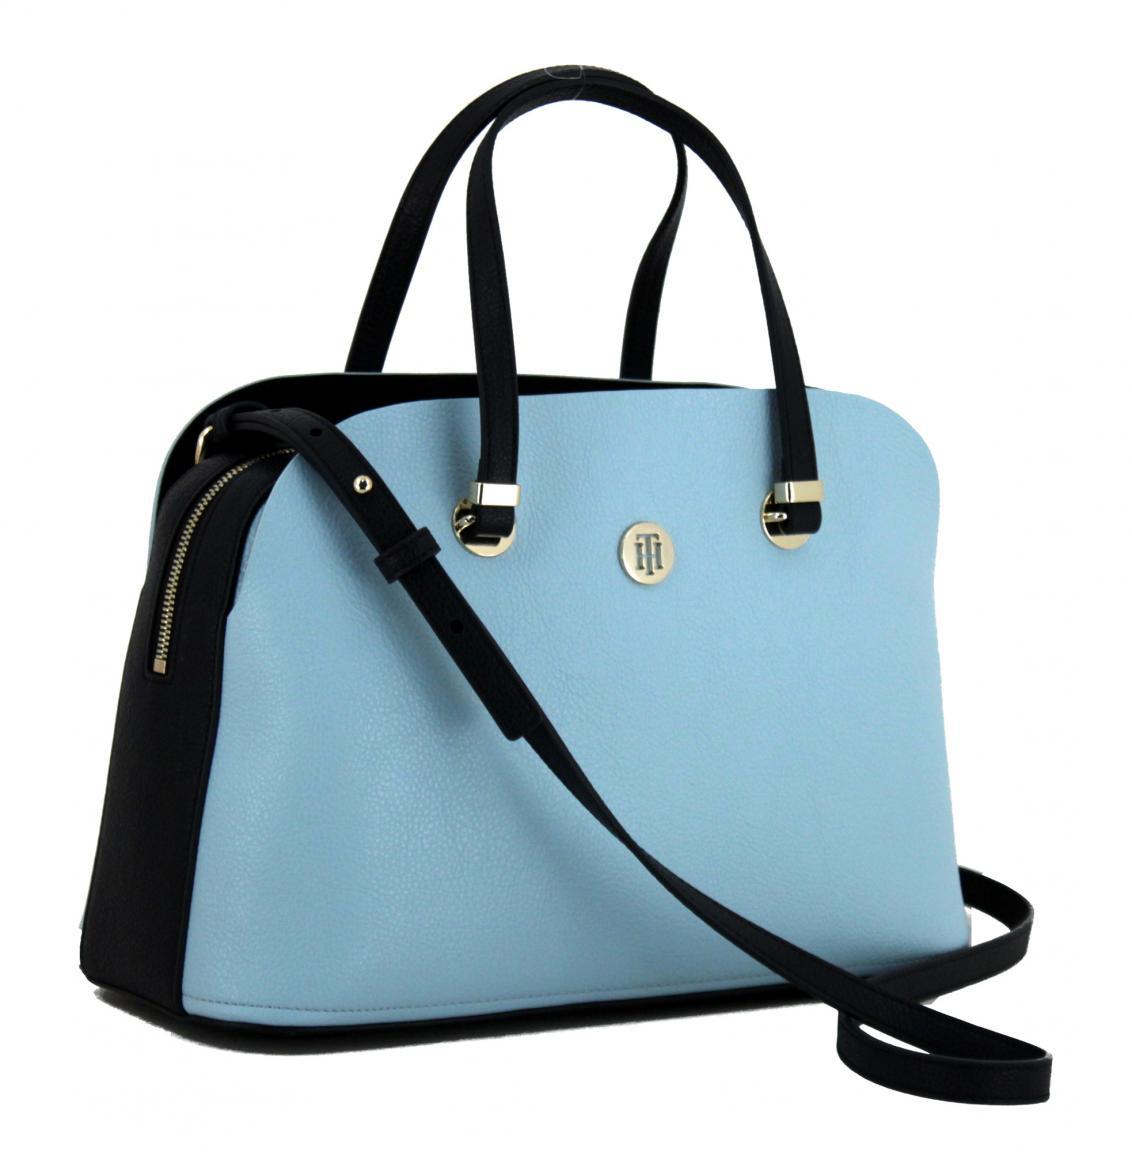 Handtasche Tommy Hilfiger Core Satchel hellblau Schultergurt